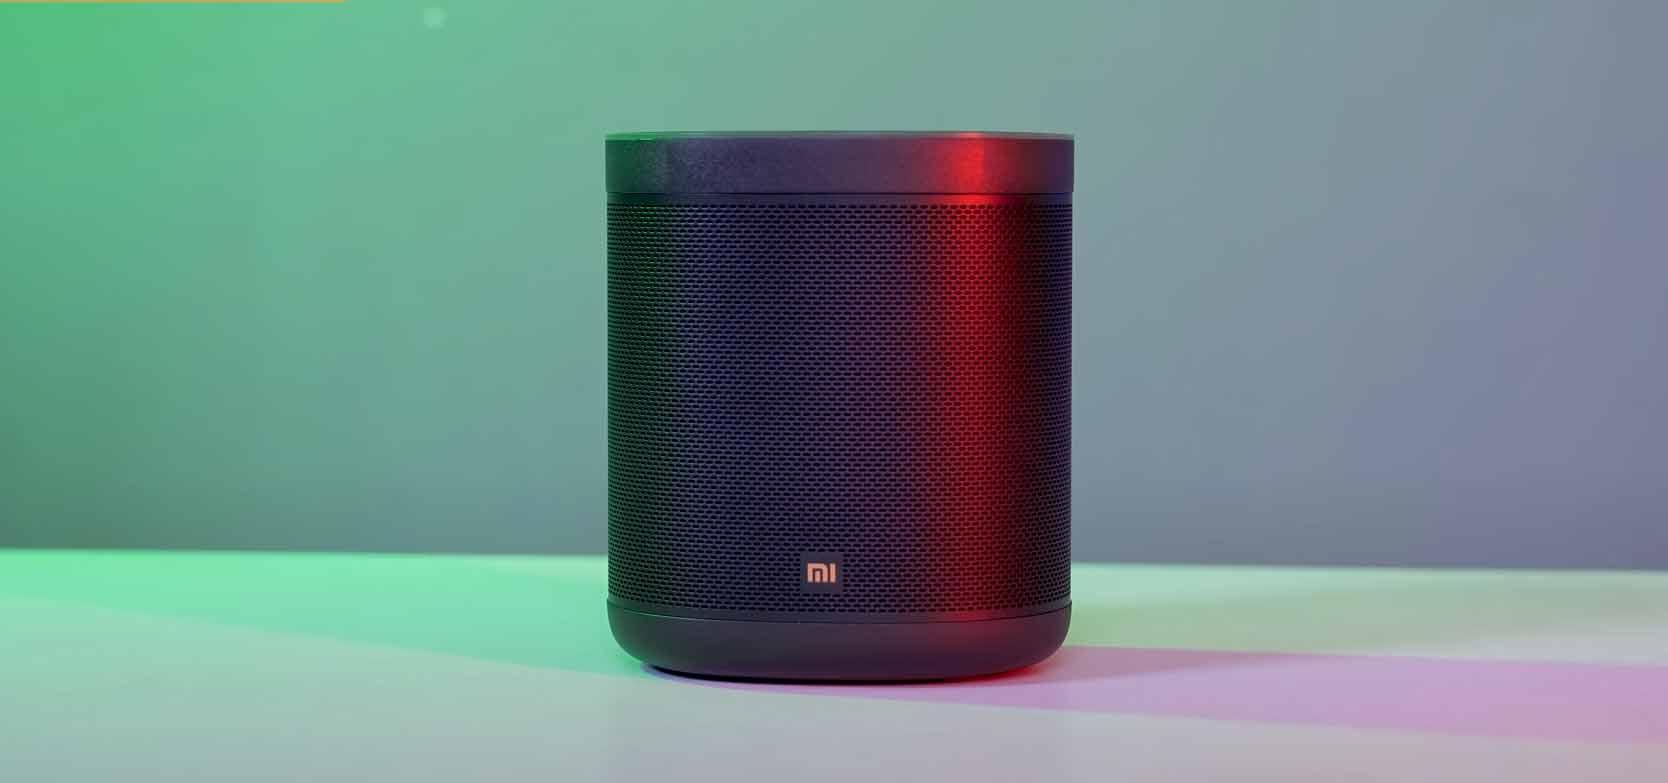 mi smart speaker vs echo dot